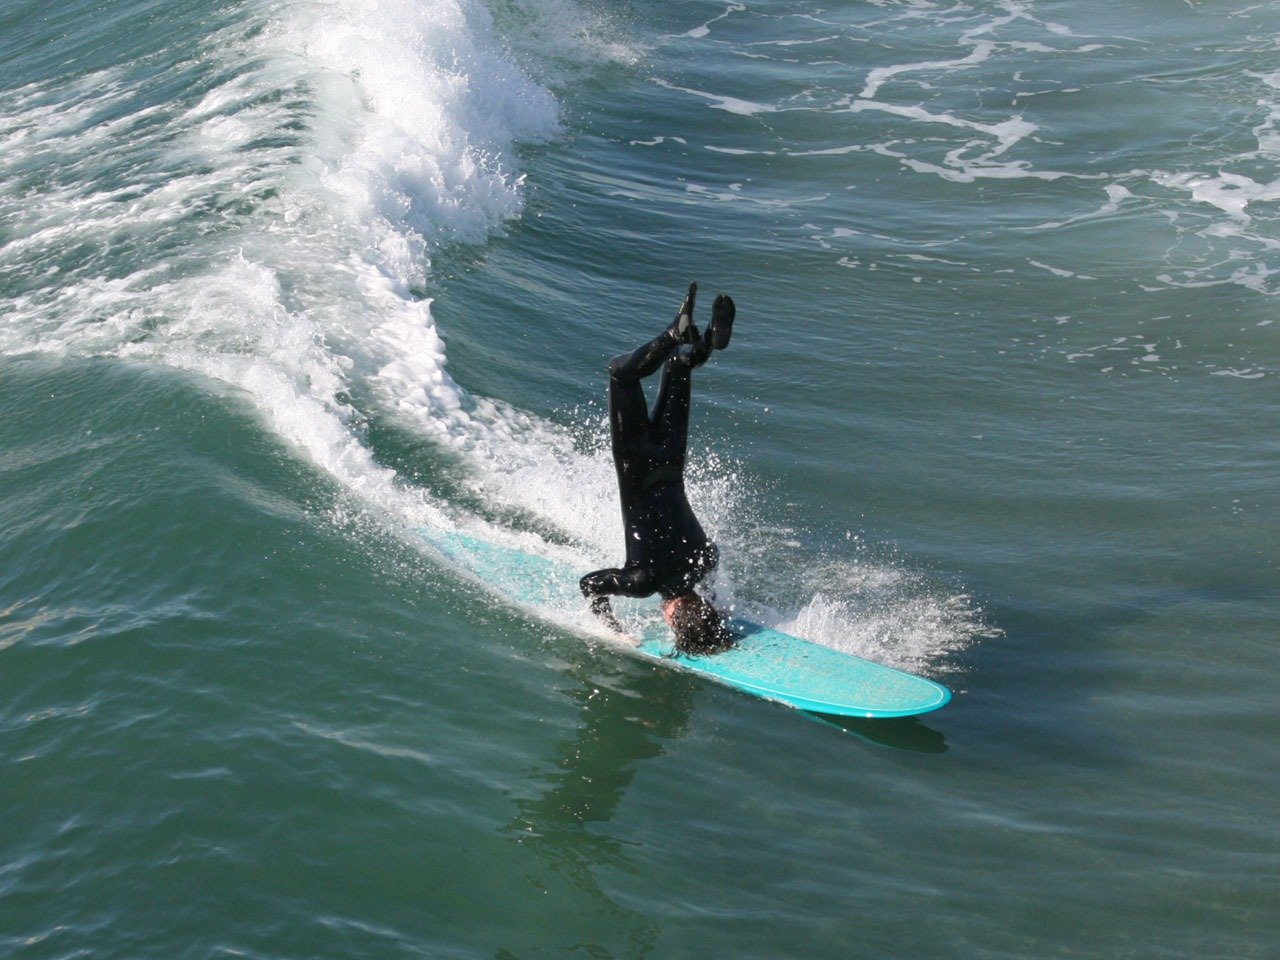 Guy surfing on his head in Huntington Beach, California's Surf City